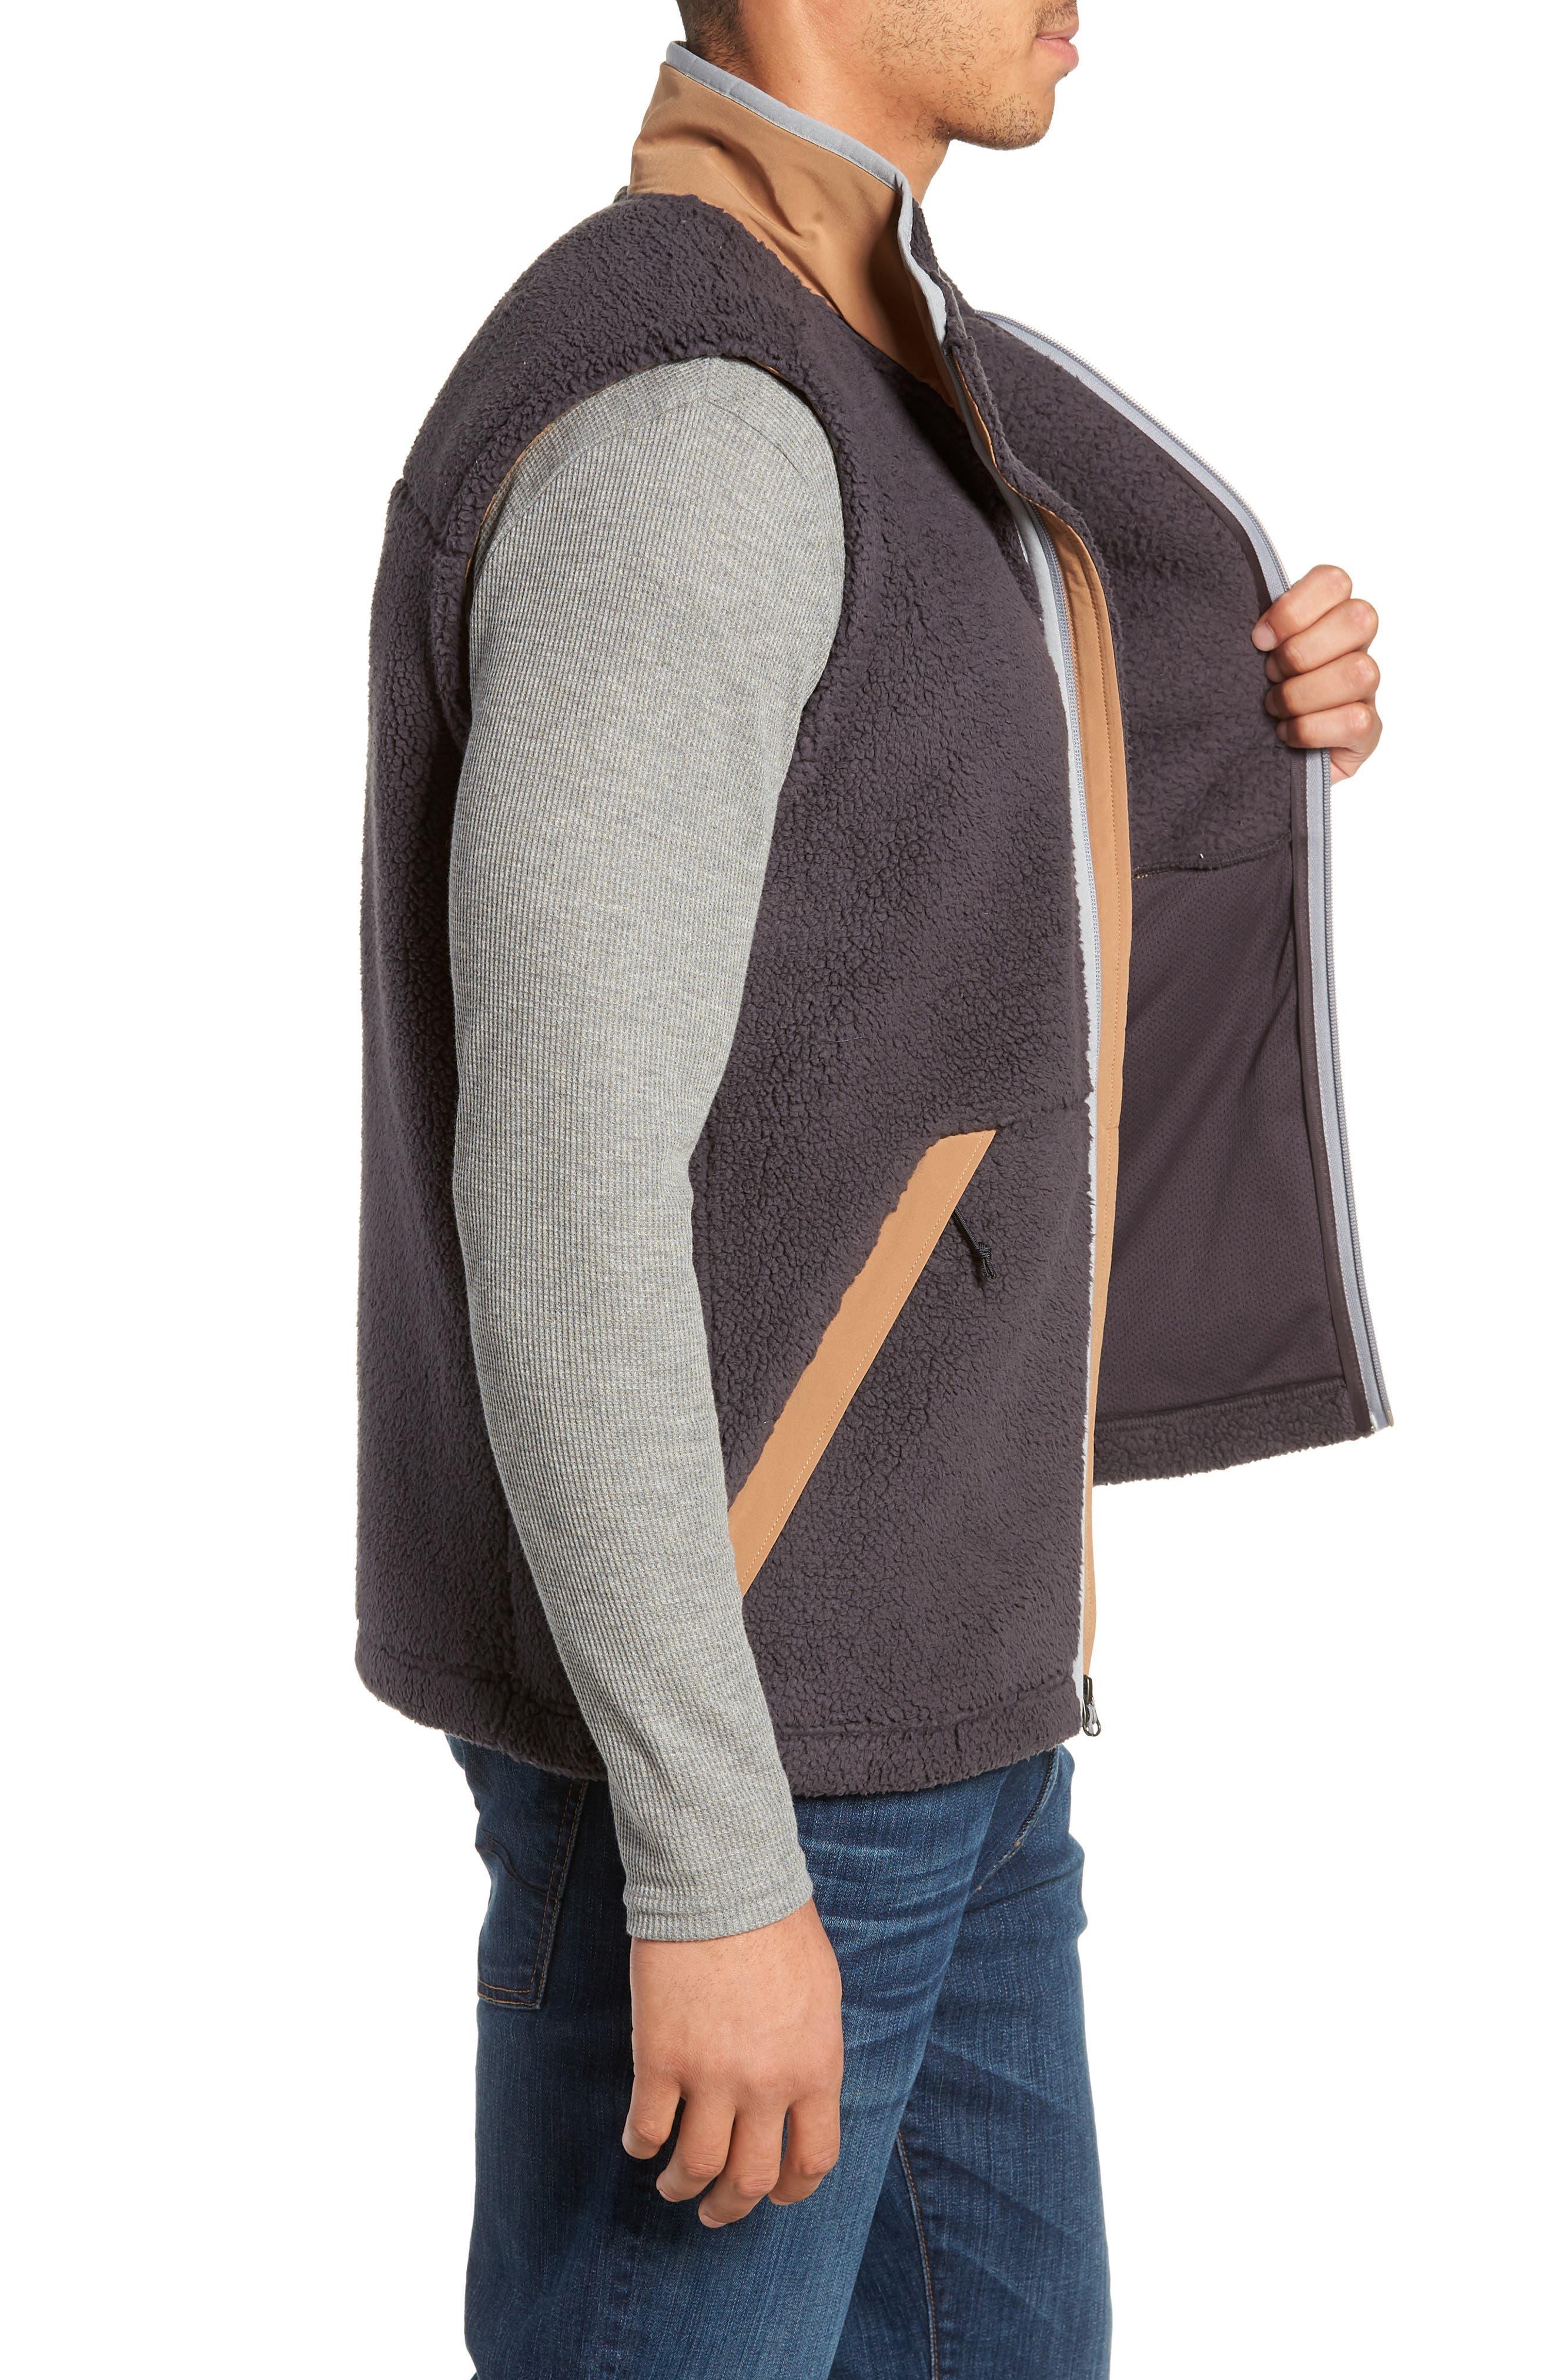 Campshire Fleece Vest,                             Alternate thumbnail 3, color,                             WEATHERED BLACK/ CARGO KHAKI